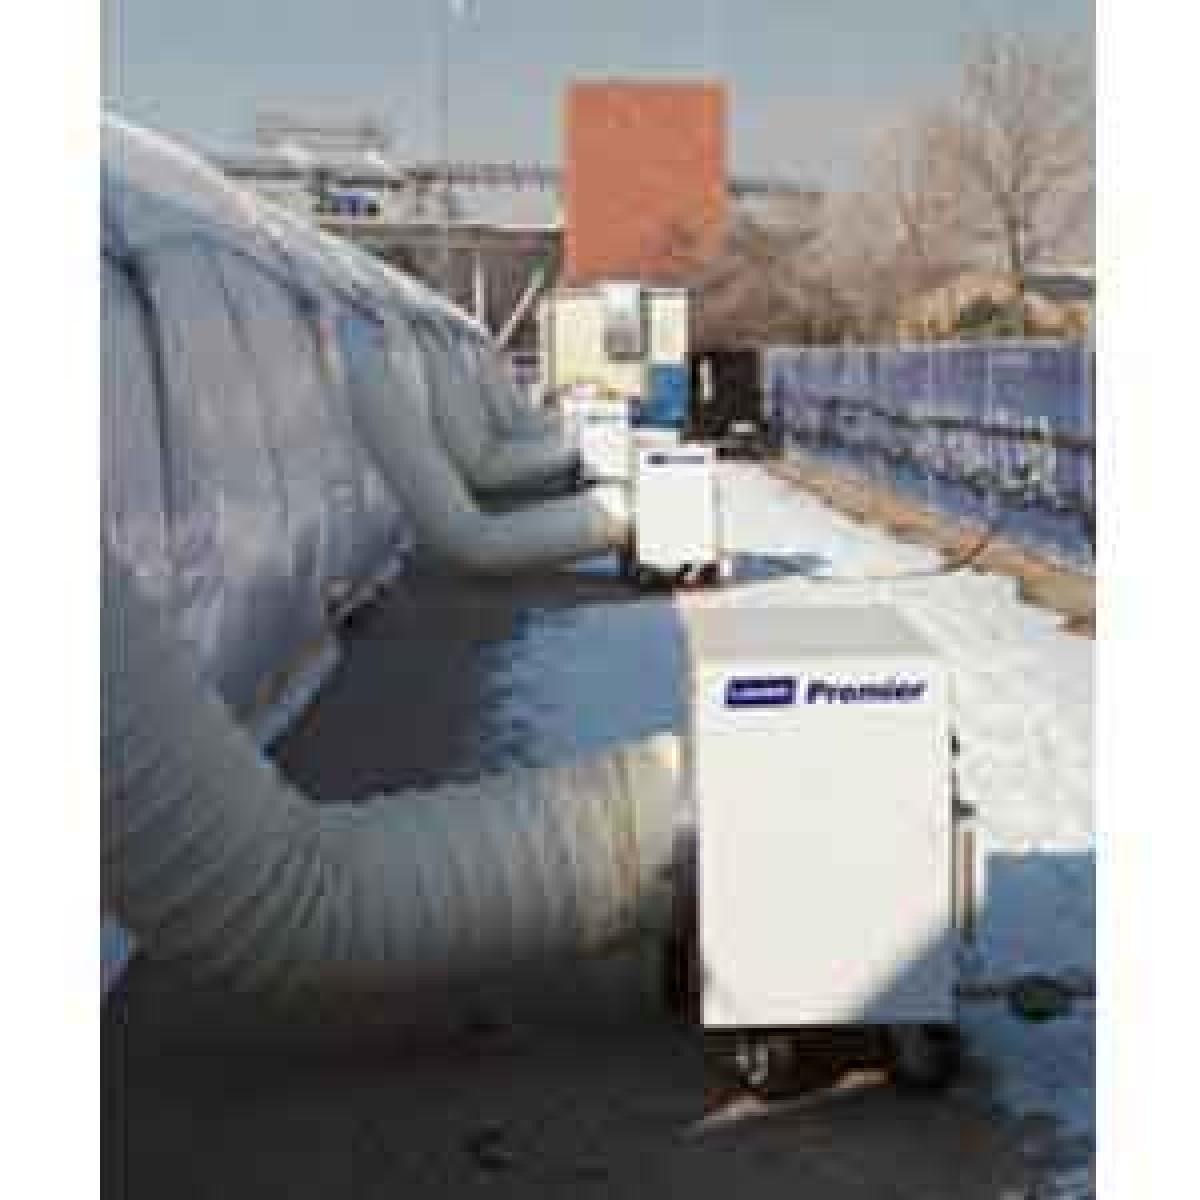 Lb White Premier 170 Lp Propane Tent Heater 170 000 Btu